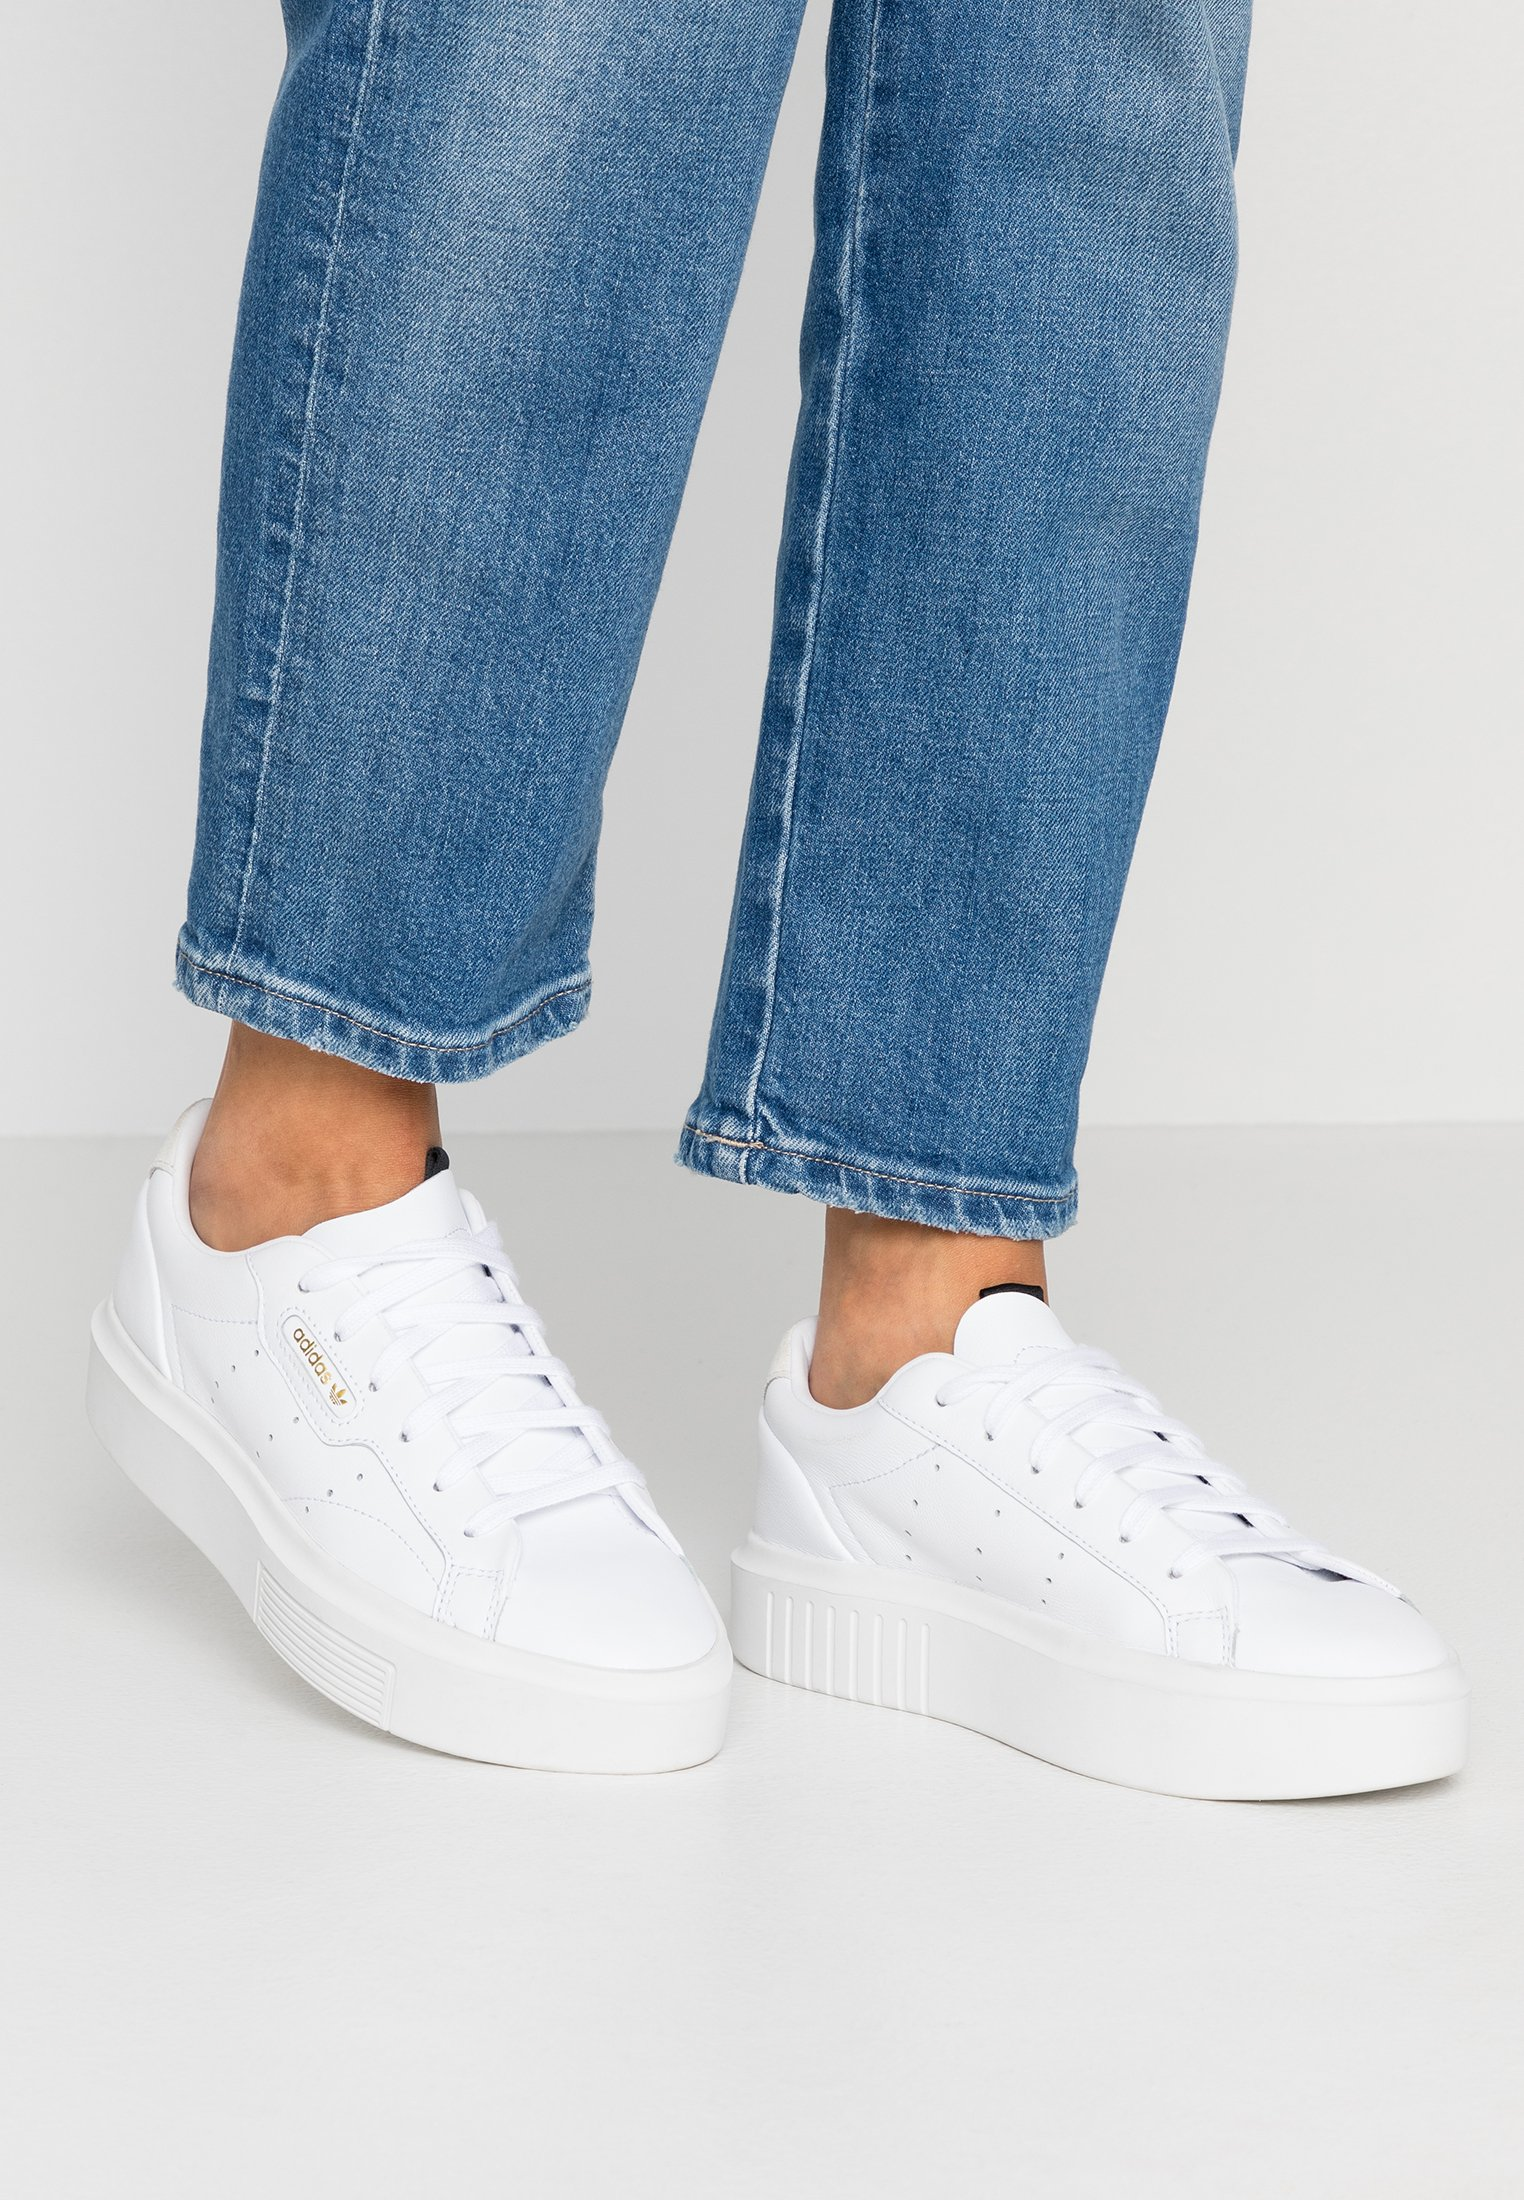 adidas Originals SLEEK SUPER - Trainers - footwear white/crystal white/core  black - Zalando.co.uk